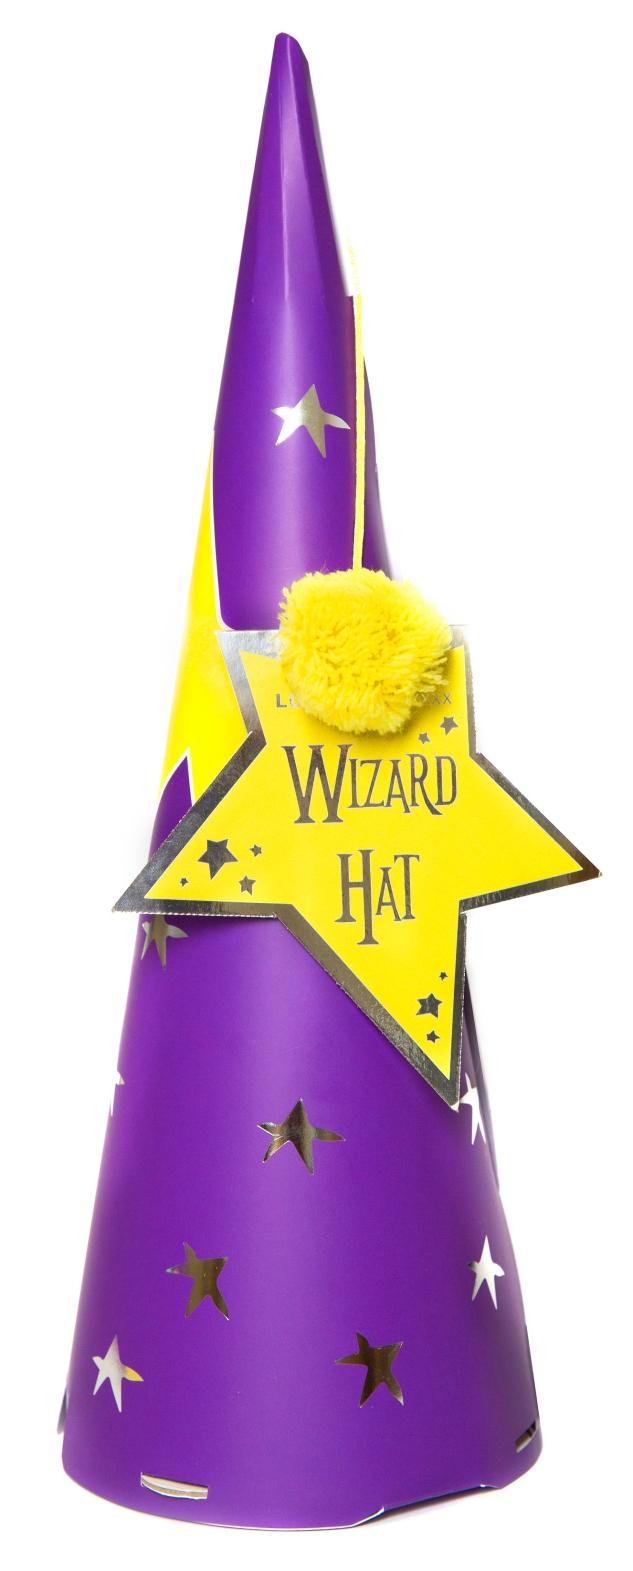 Lush - Wizard Hat